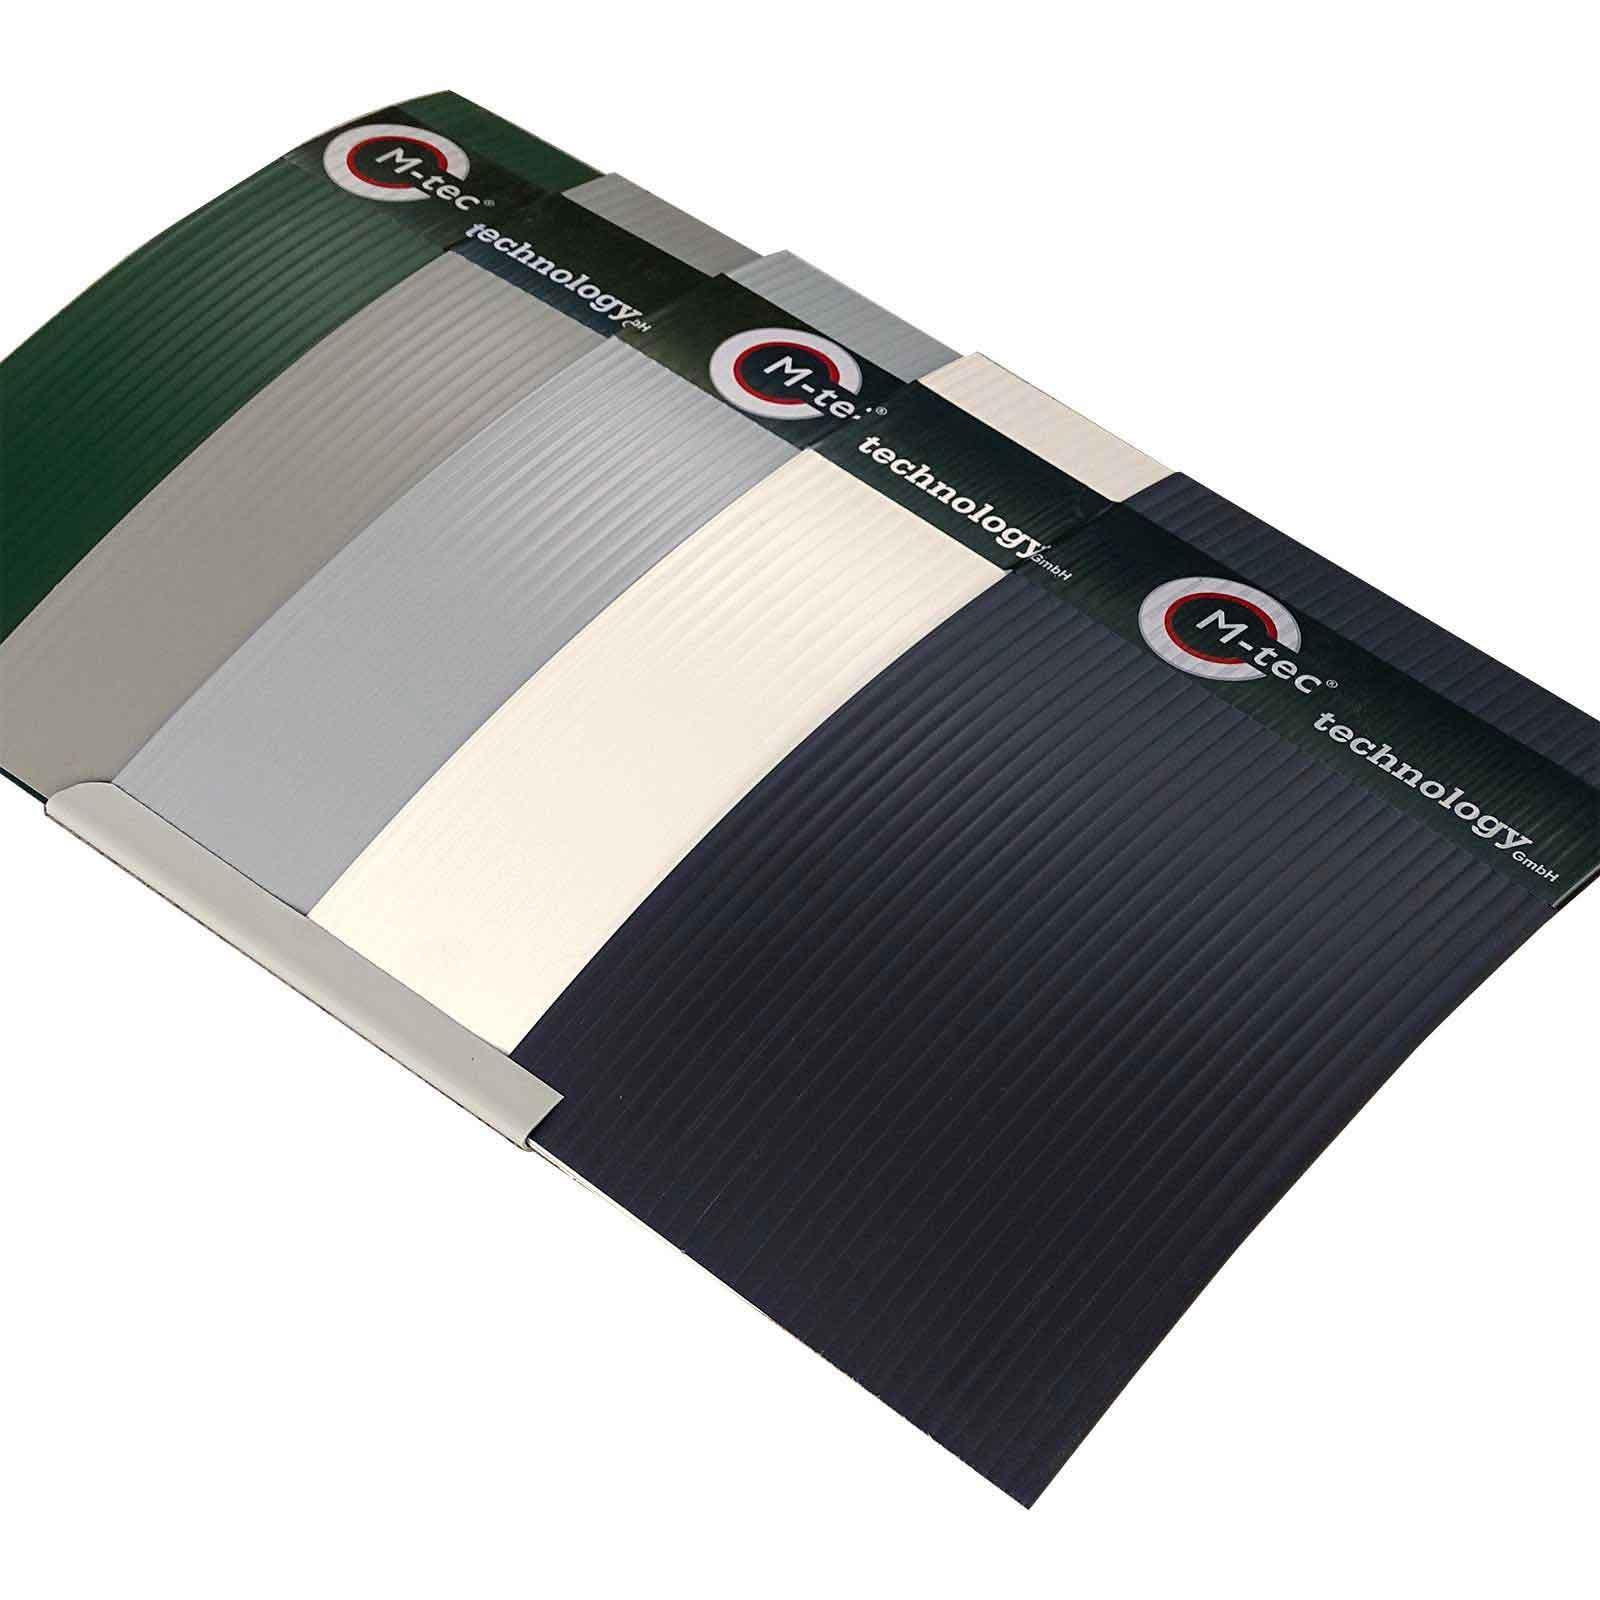 Musterfächer Hart PVC in 5 Farben